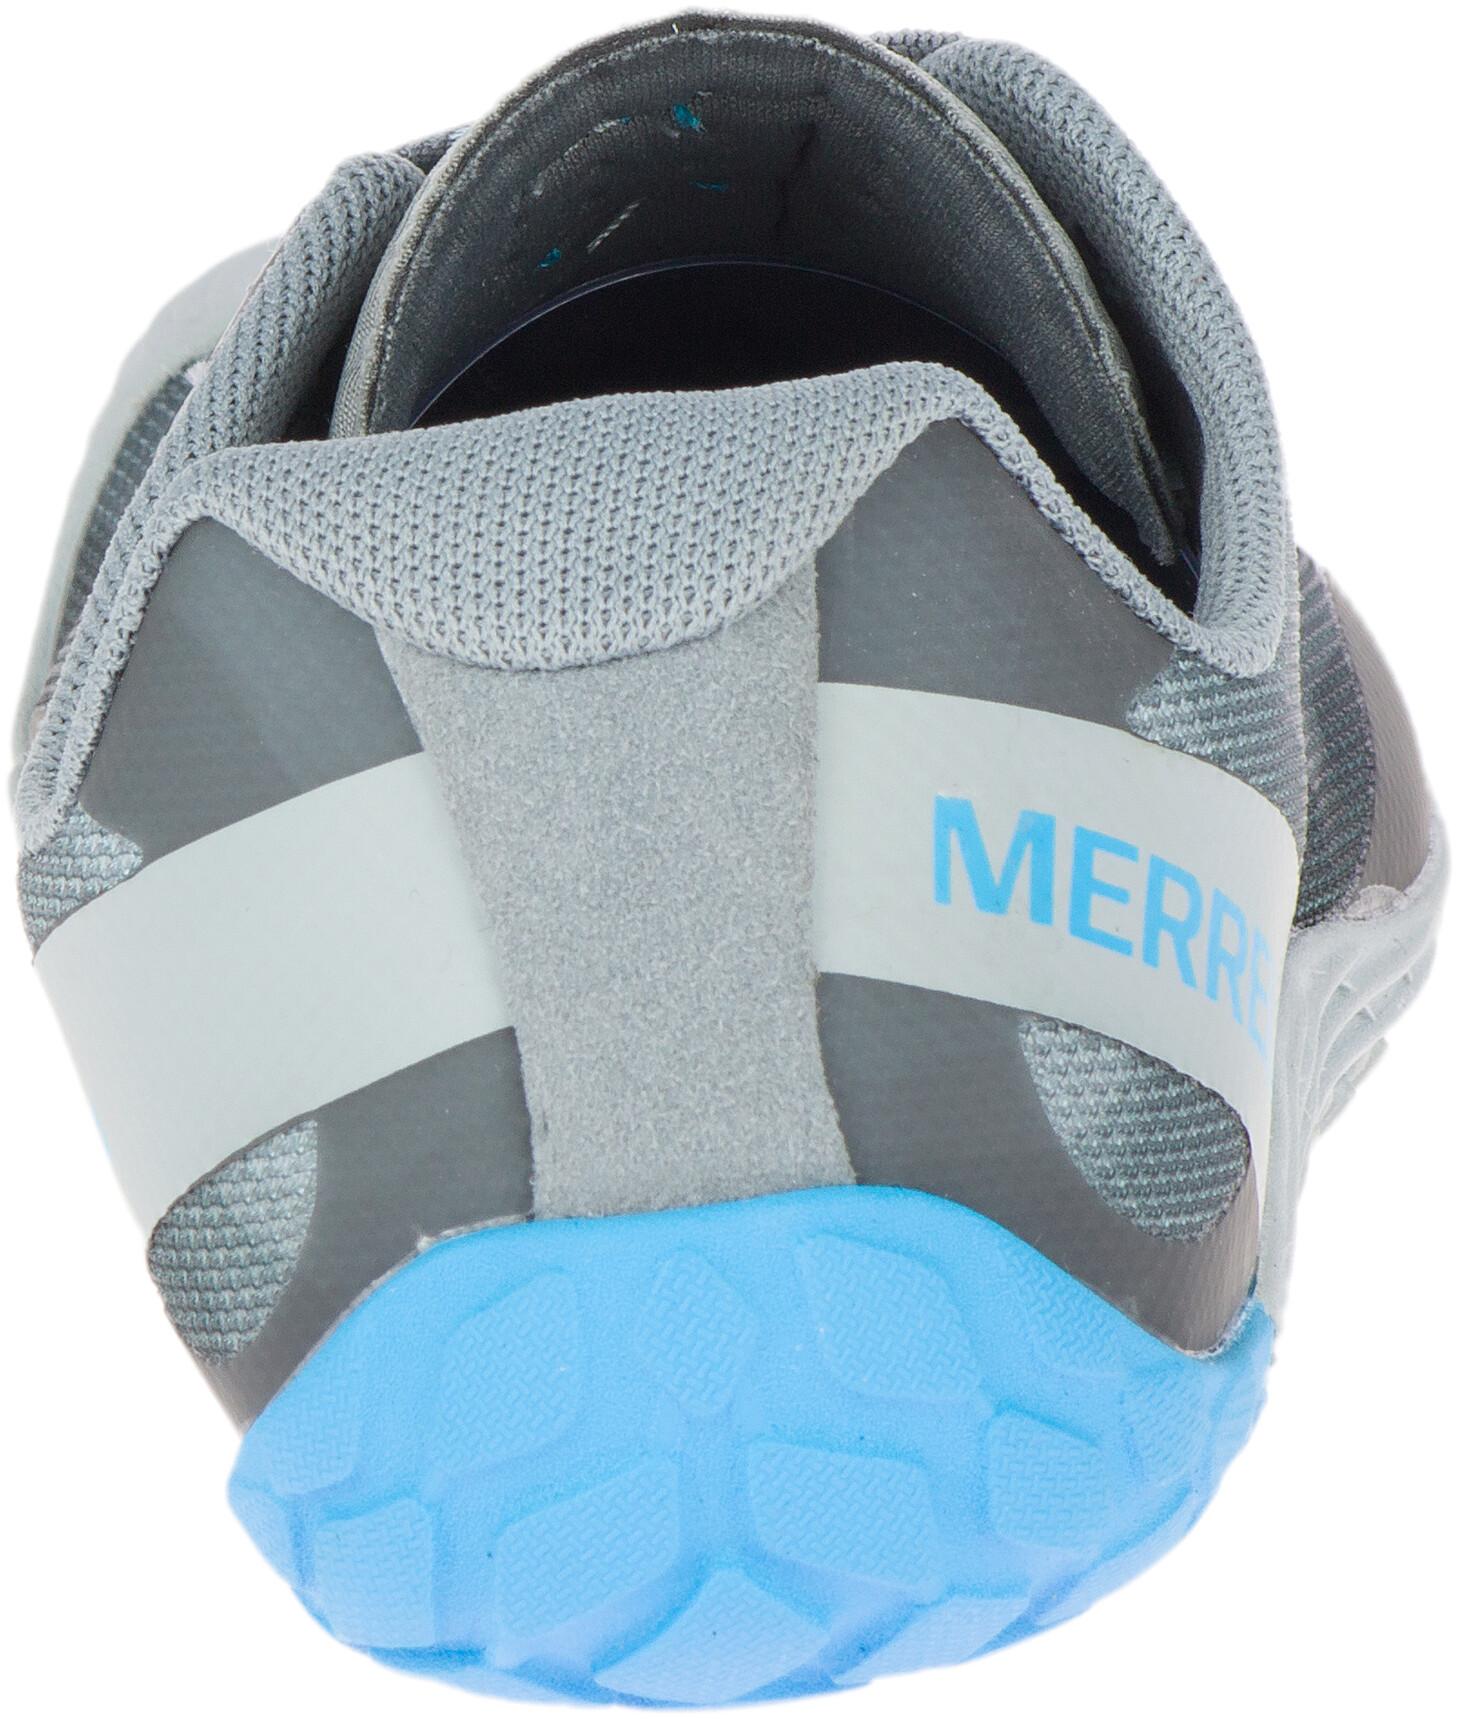 Merrell Vapor Glove 4 Shoes Dam monument